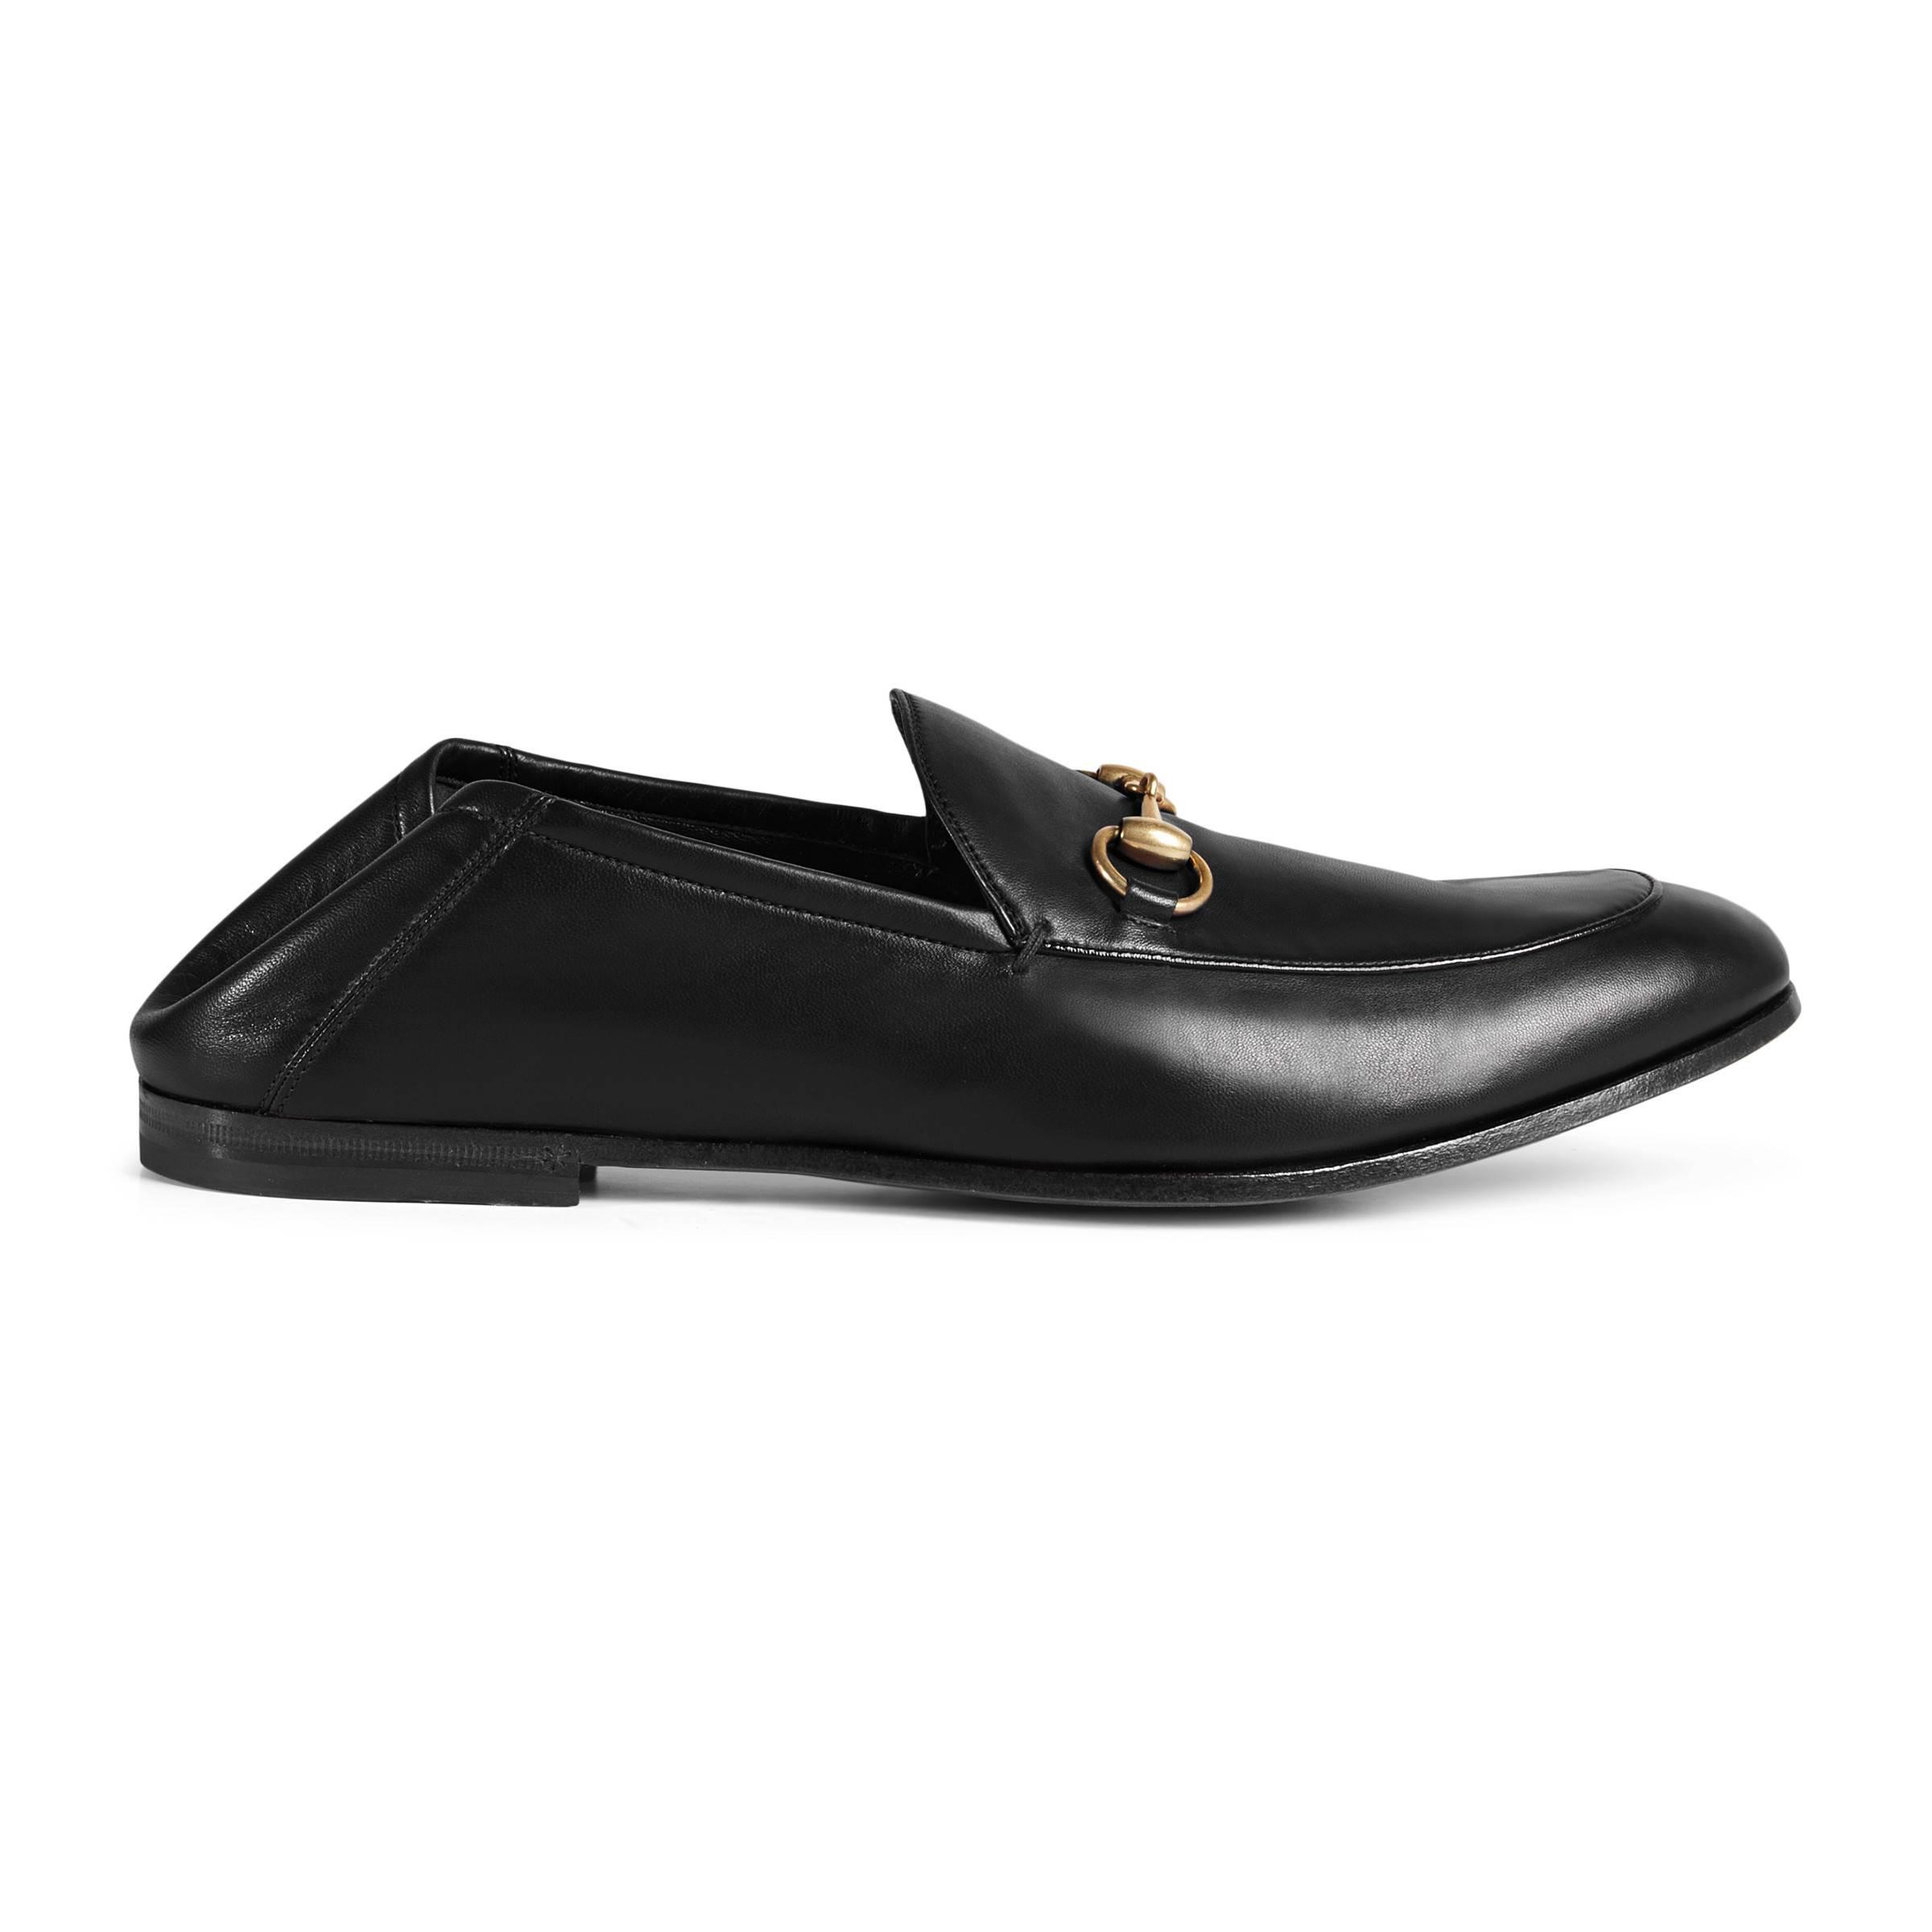 65276b6dcdb Gucci Horsebit Leather Loafer in Black for Men - Lyst